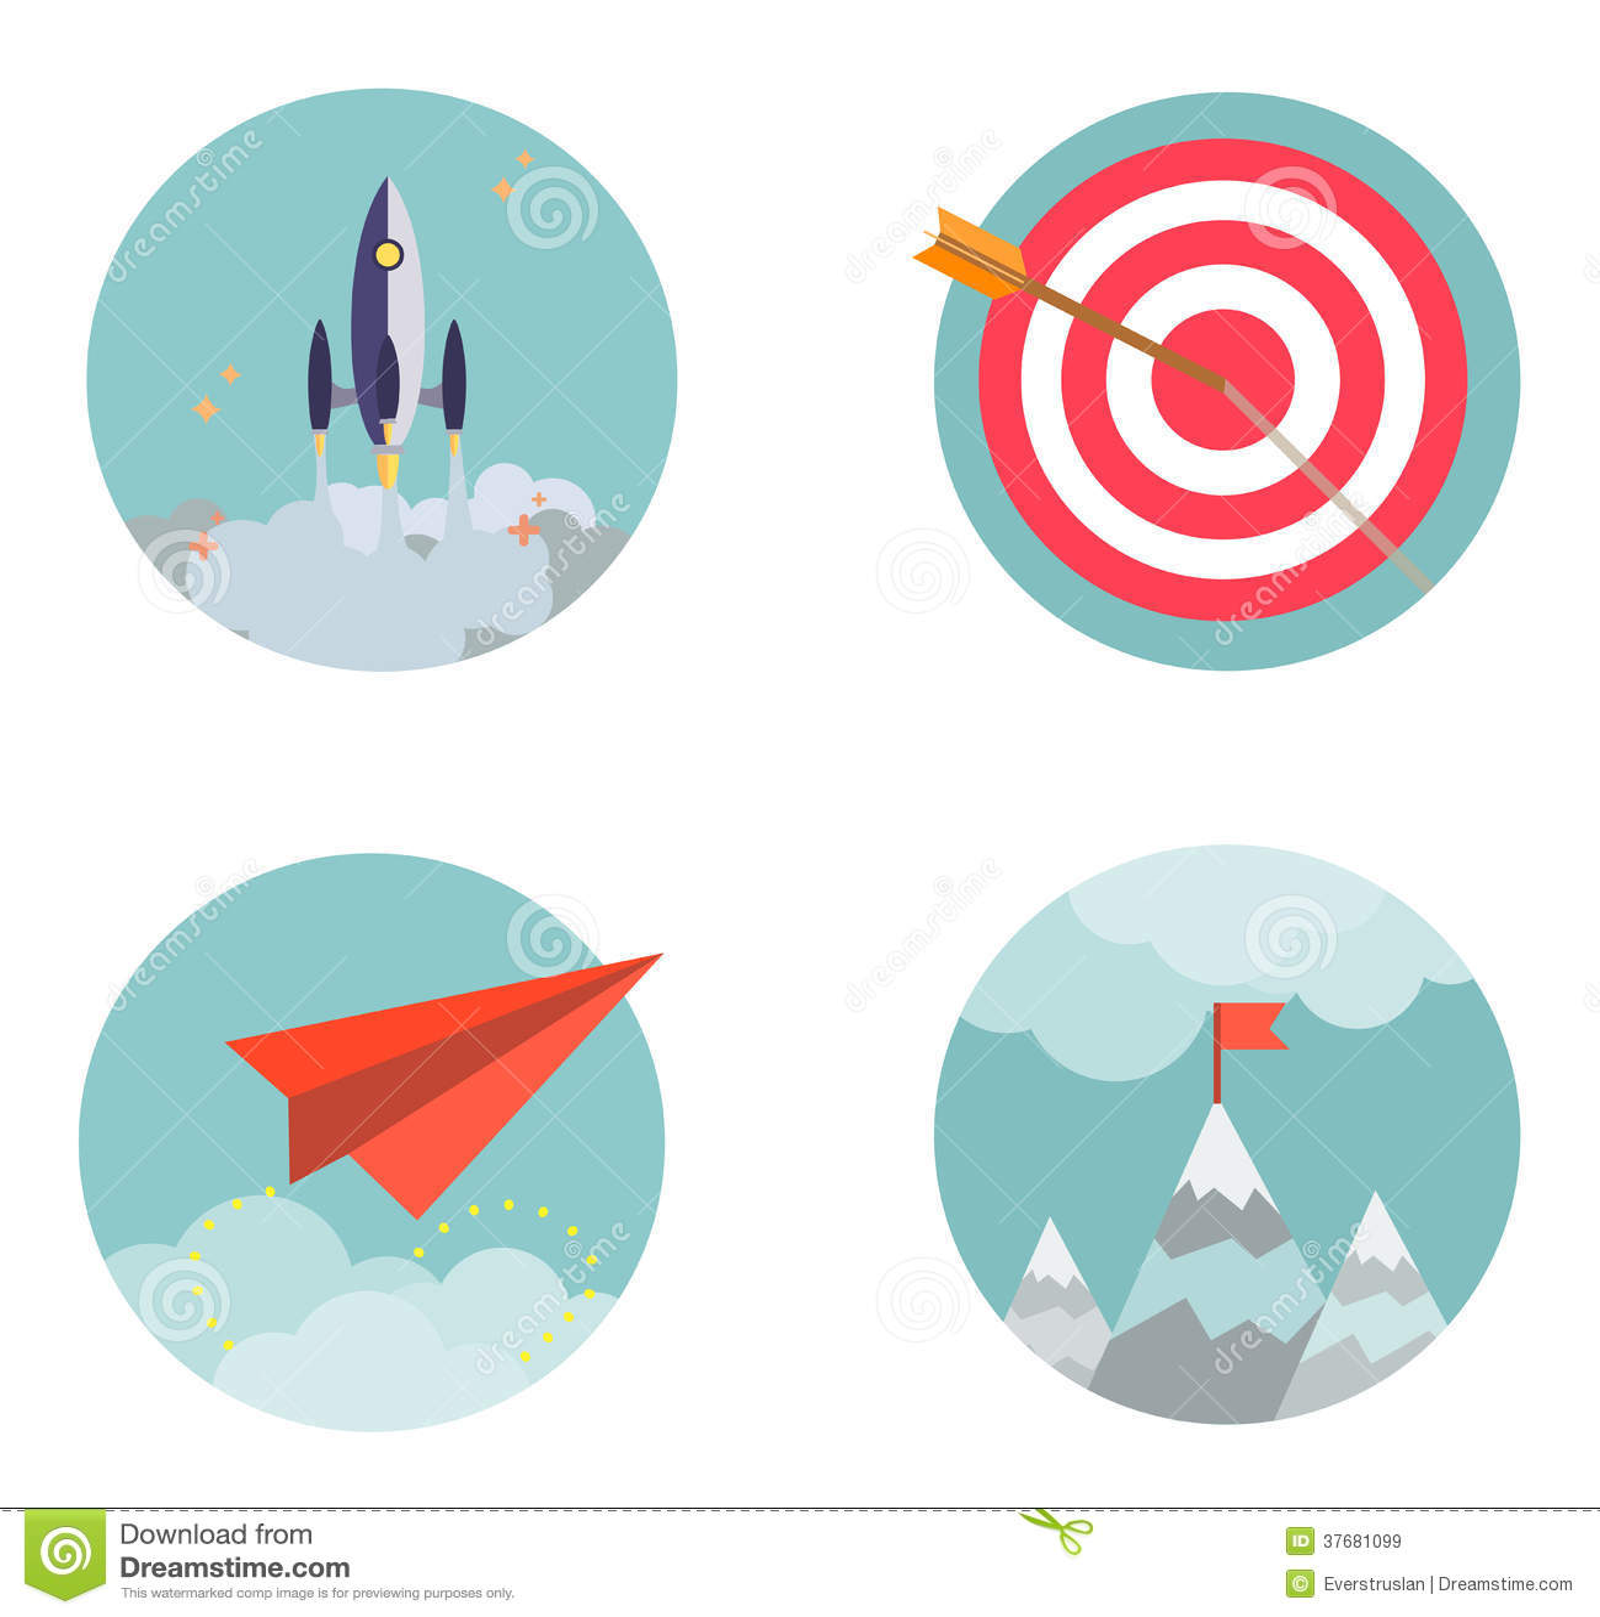 Business Development Icon : Flat design set icons start up business developmen royalty